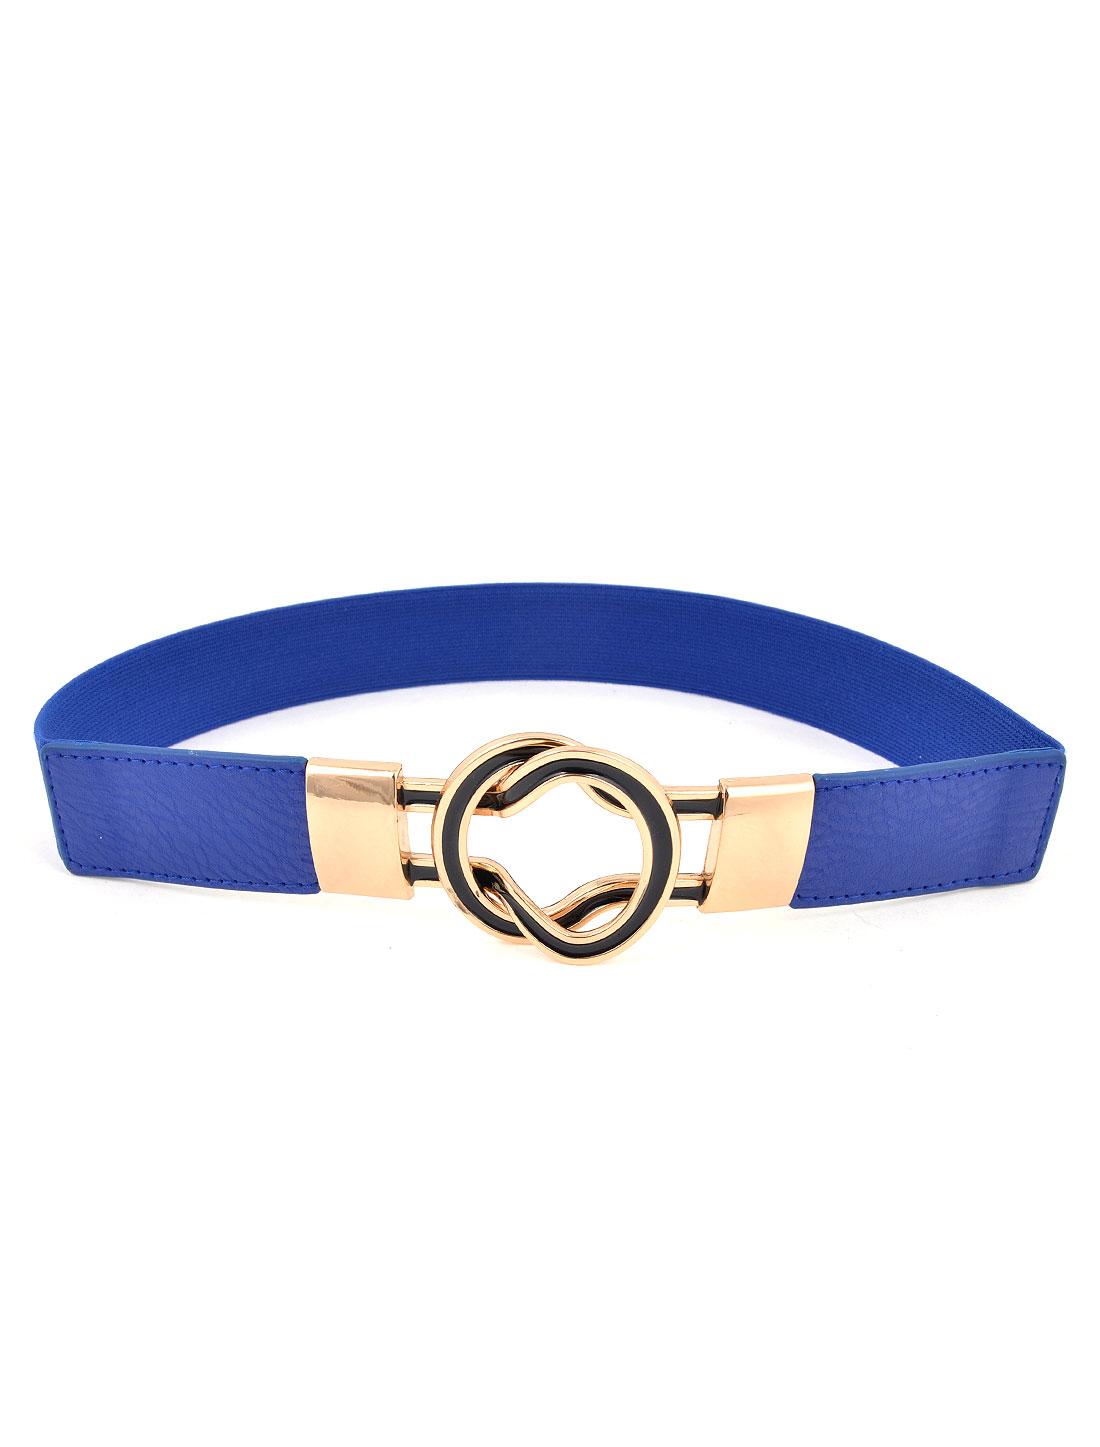 Women Round Shaped Interlocking Buckle Elastic Skirt Cinch Waist Belt Blue